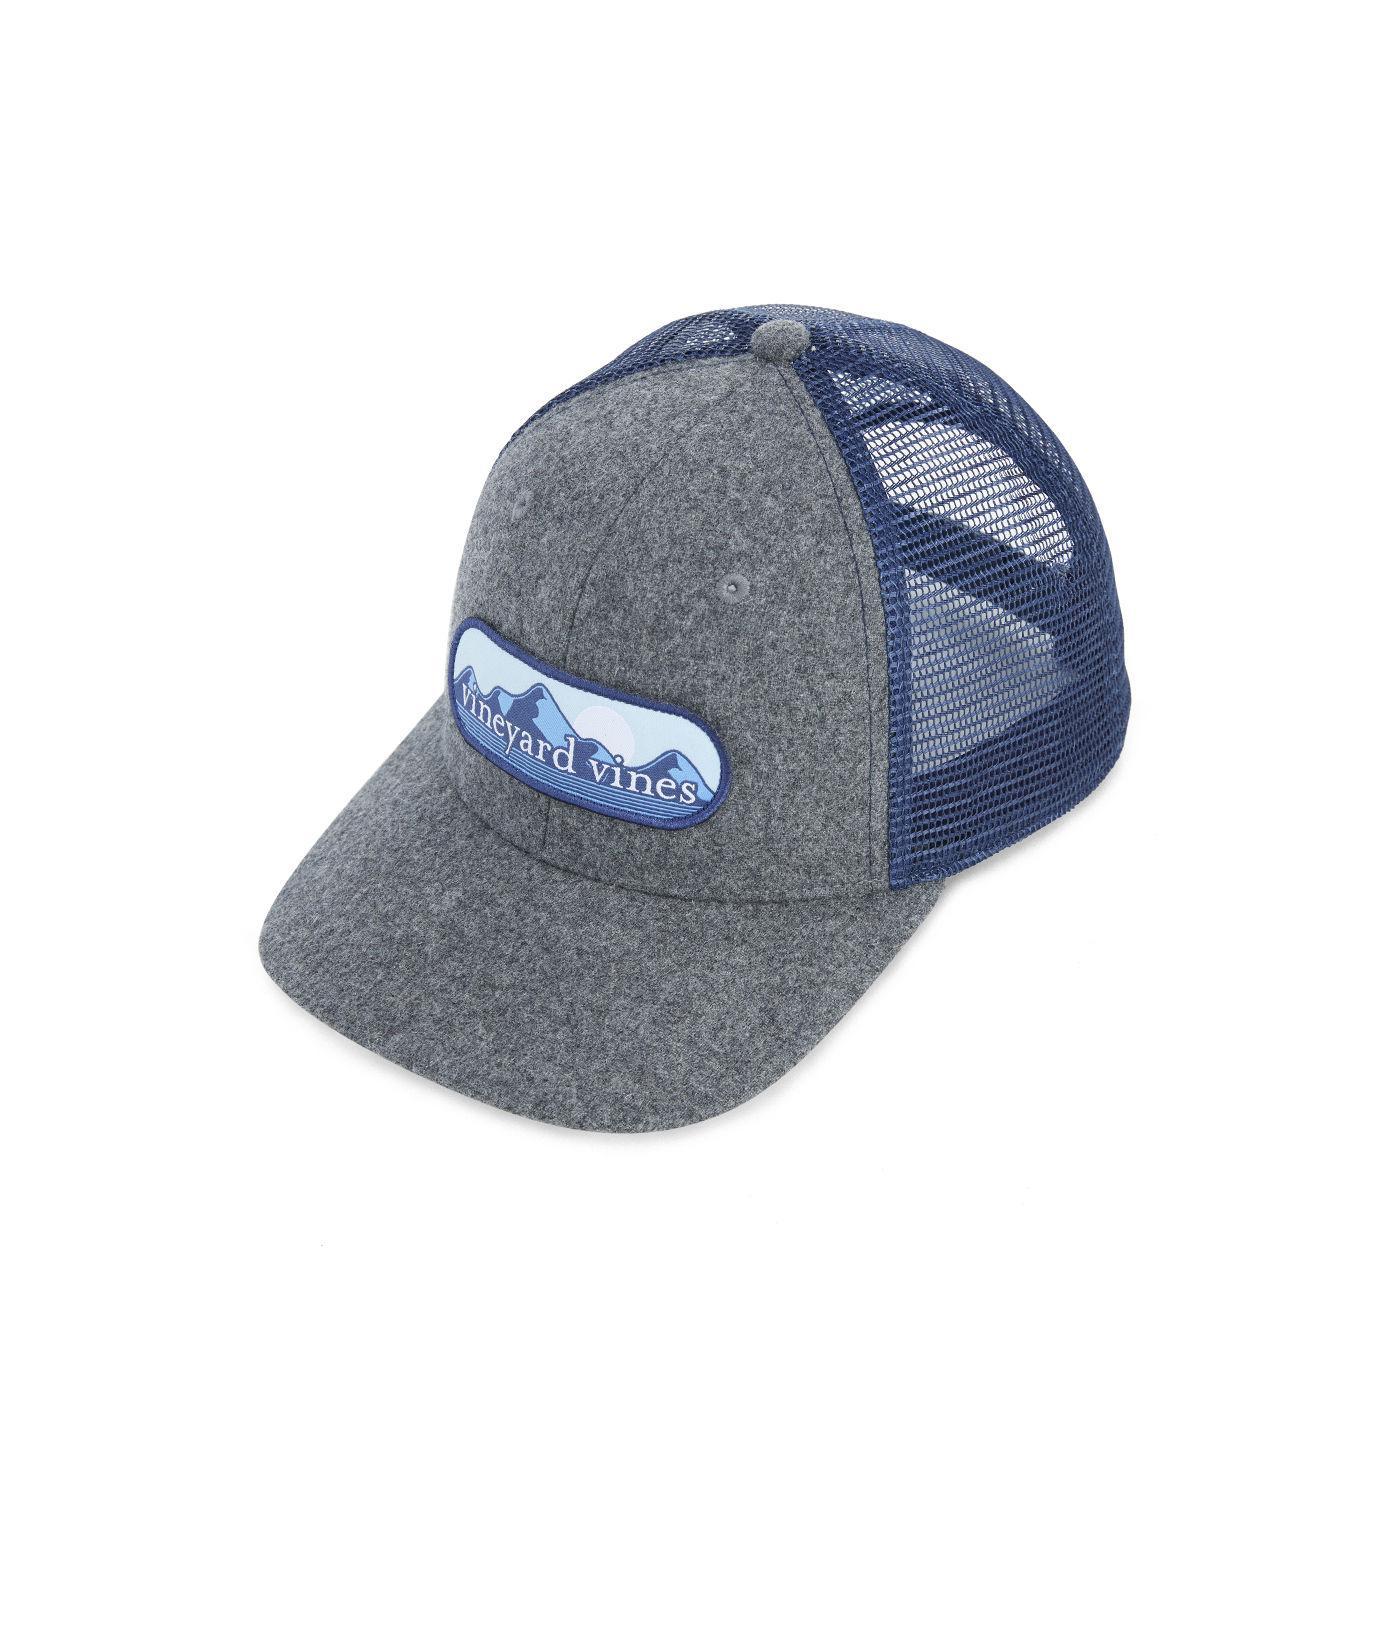 4abe752be16 Lyst - Vineyard Vines Mountain Patch Wool Trucker Hat in Blue for Men